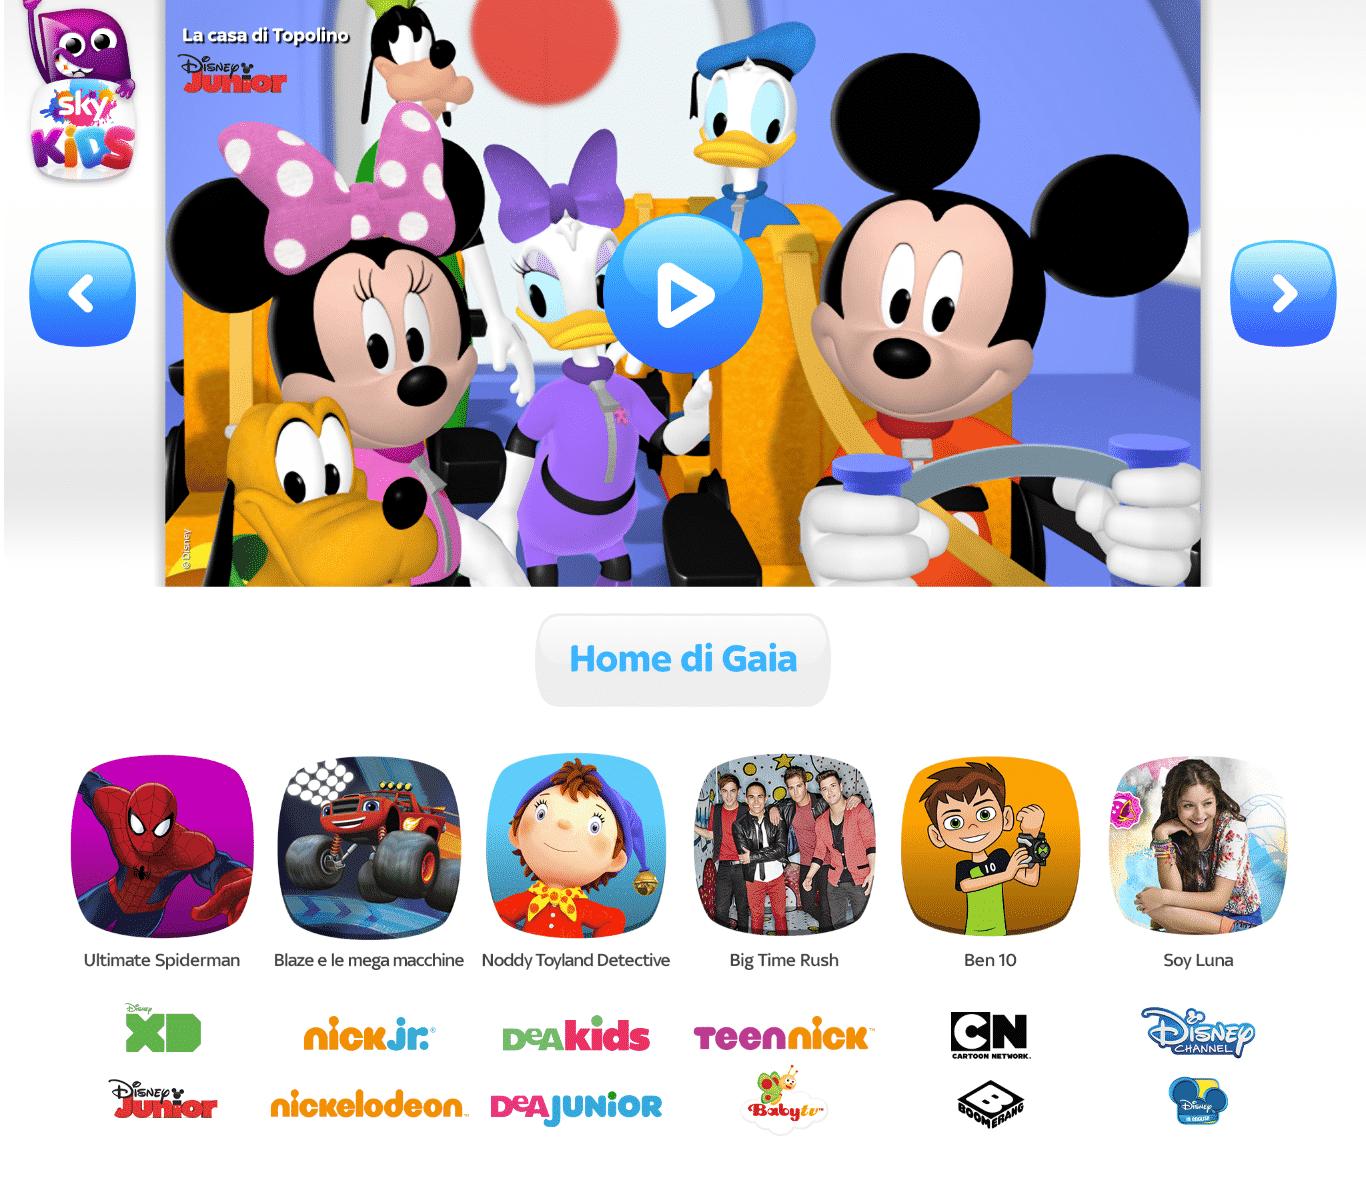 SkyKids, la nuova App di Sky dedicata ai bambini